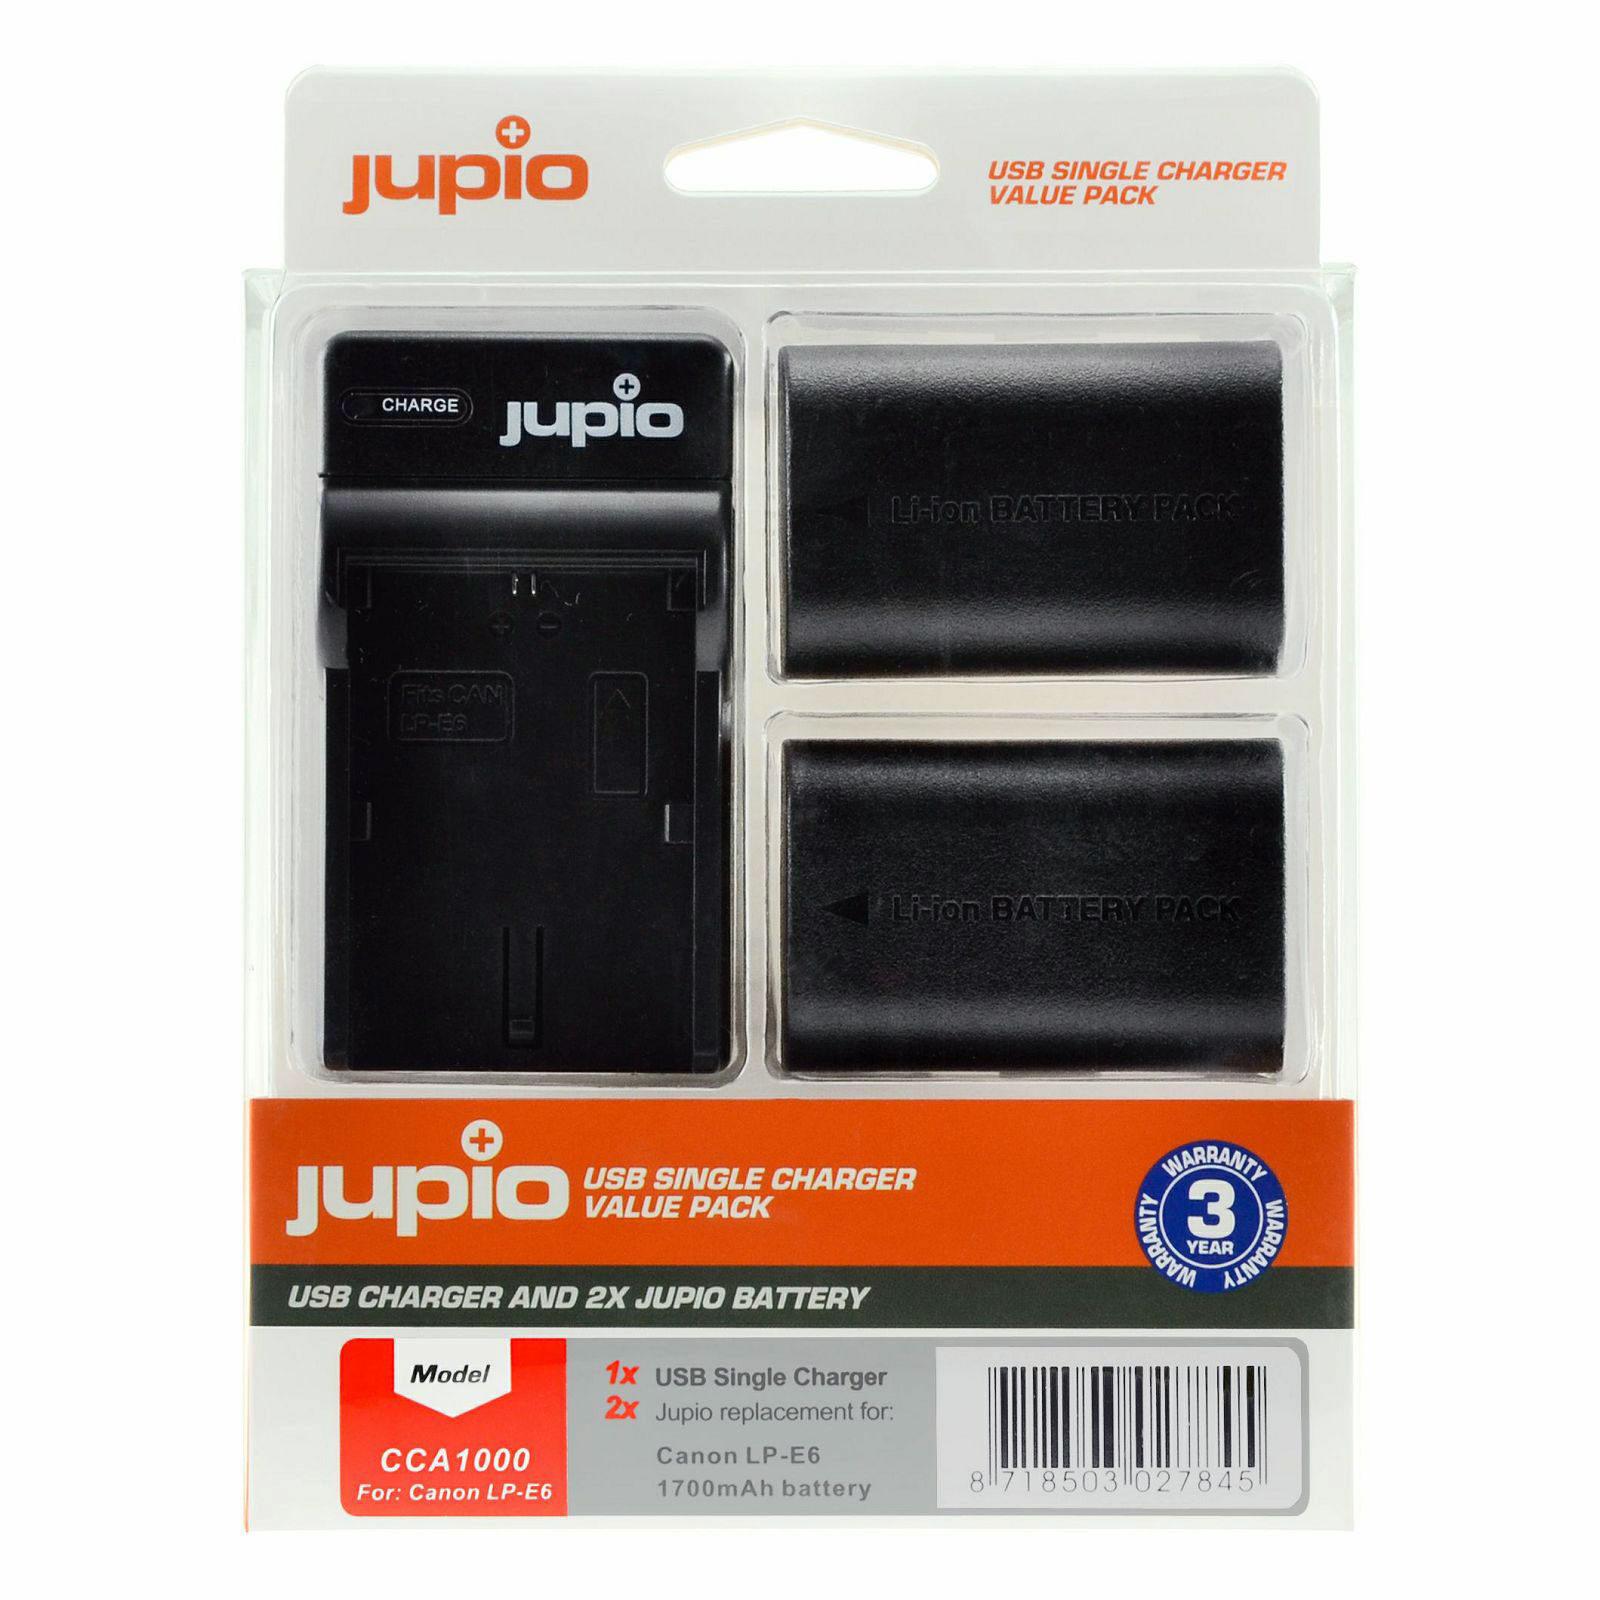 Foto van Canon LP-E6 USB Single Charger Kit (Merk Jupio)